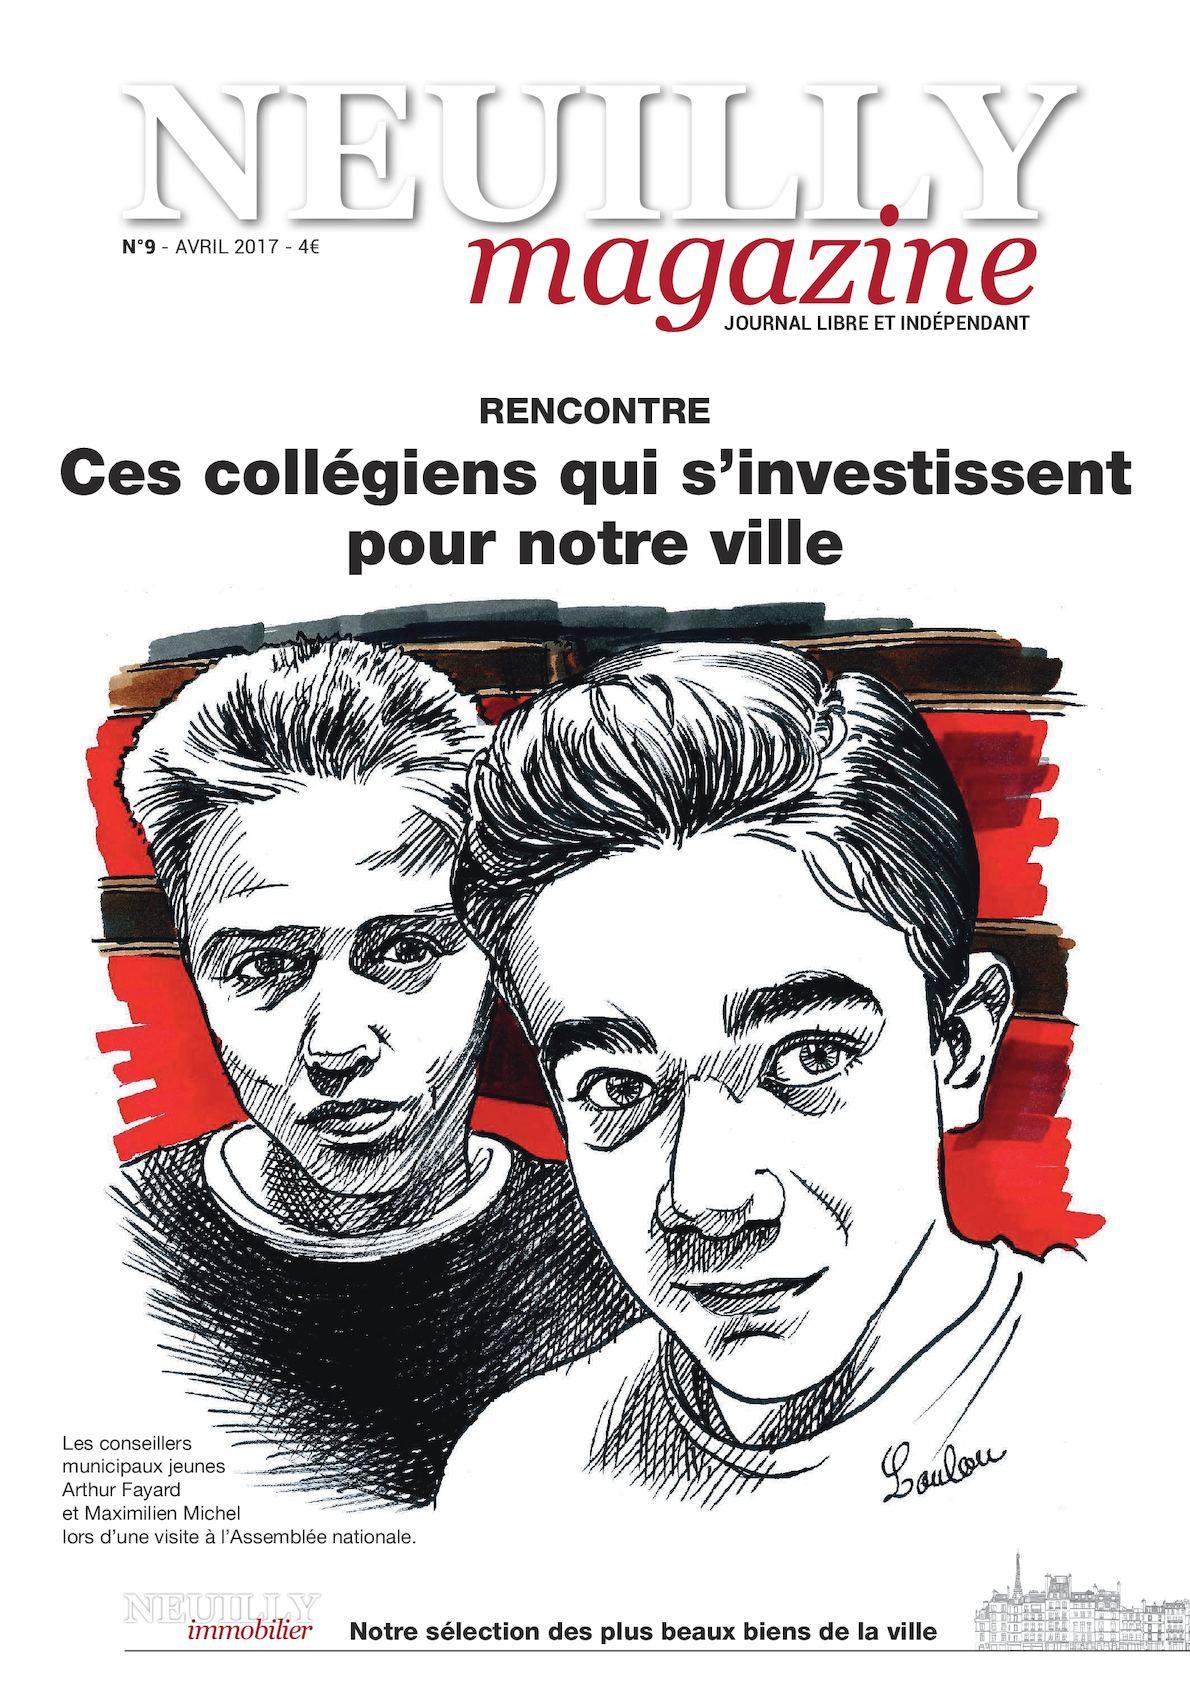 Neuilly Magazine n°9 - avril 2017